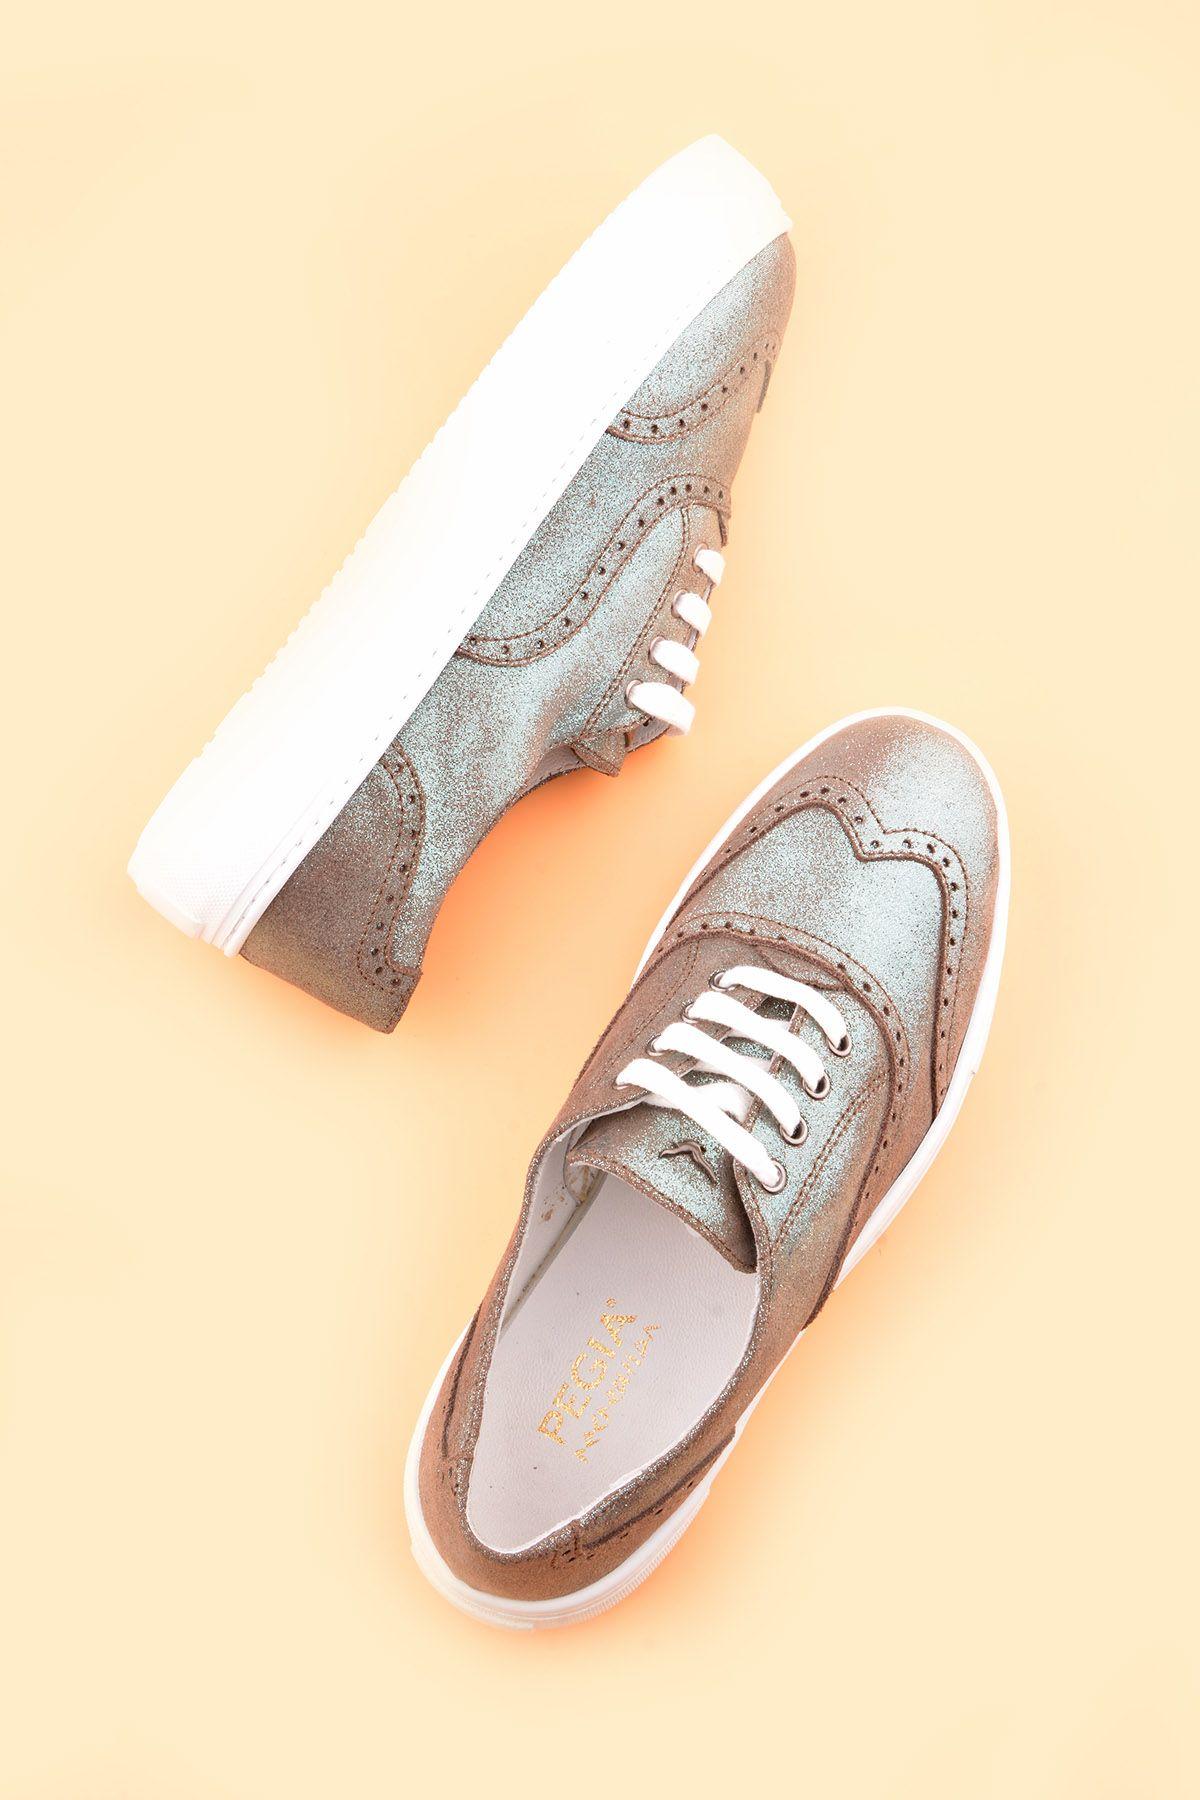 Pegia Chatalet Hakiki Deri Bayan Oxford Ayakkabı REC-014 Mint